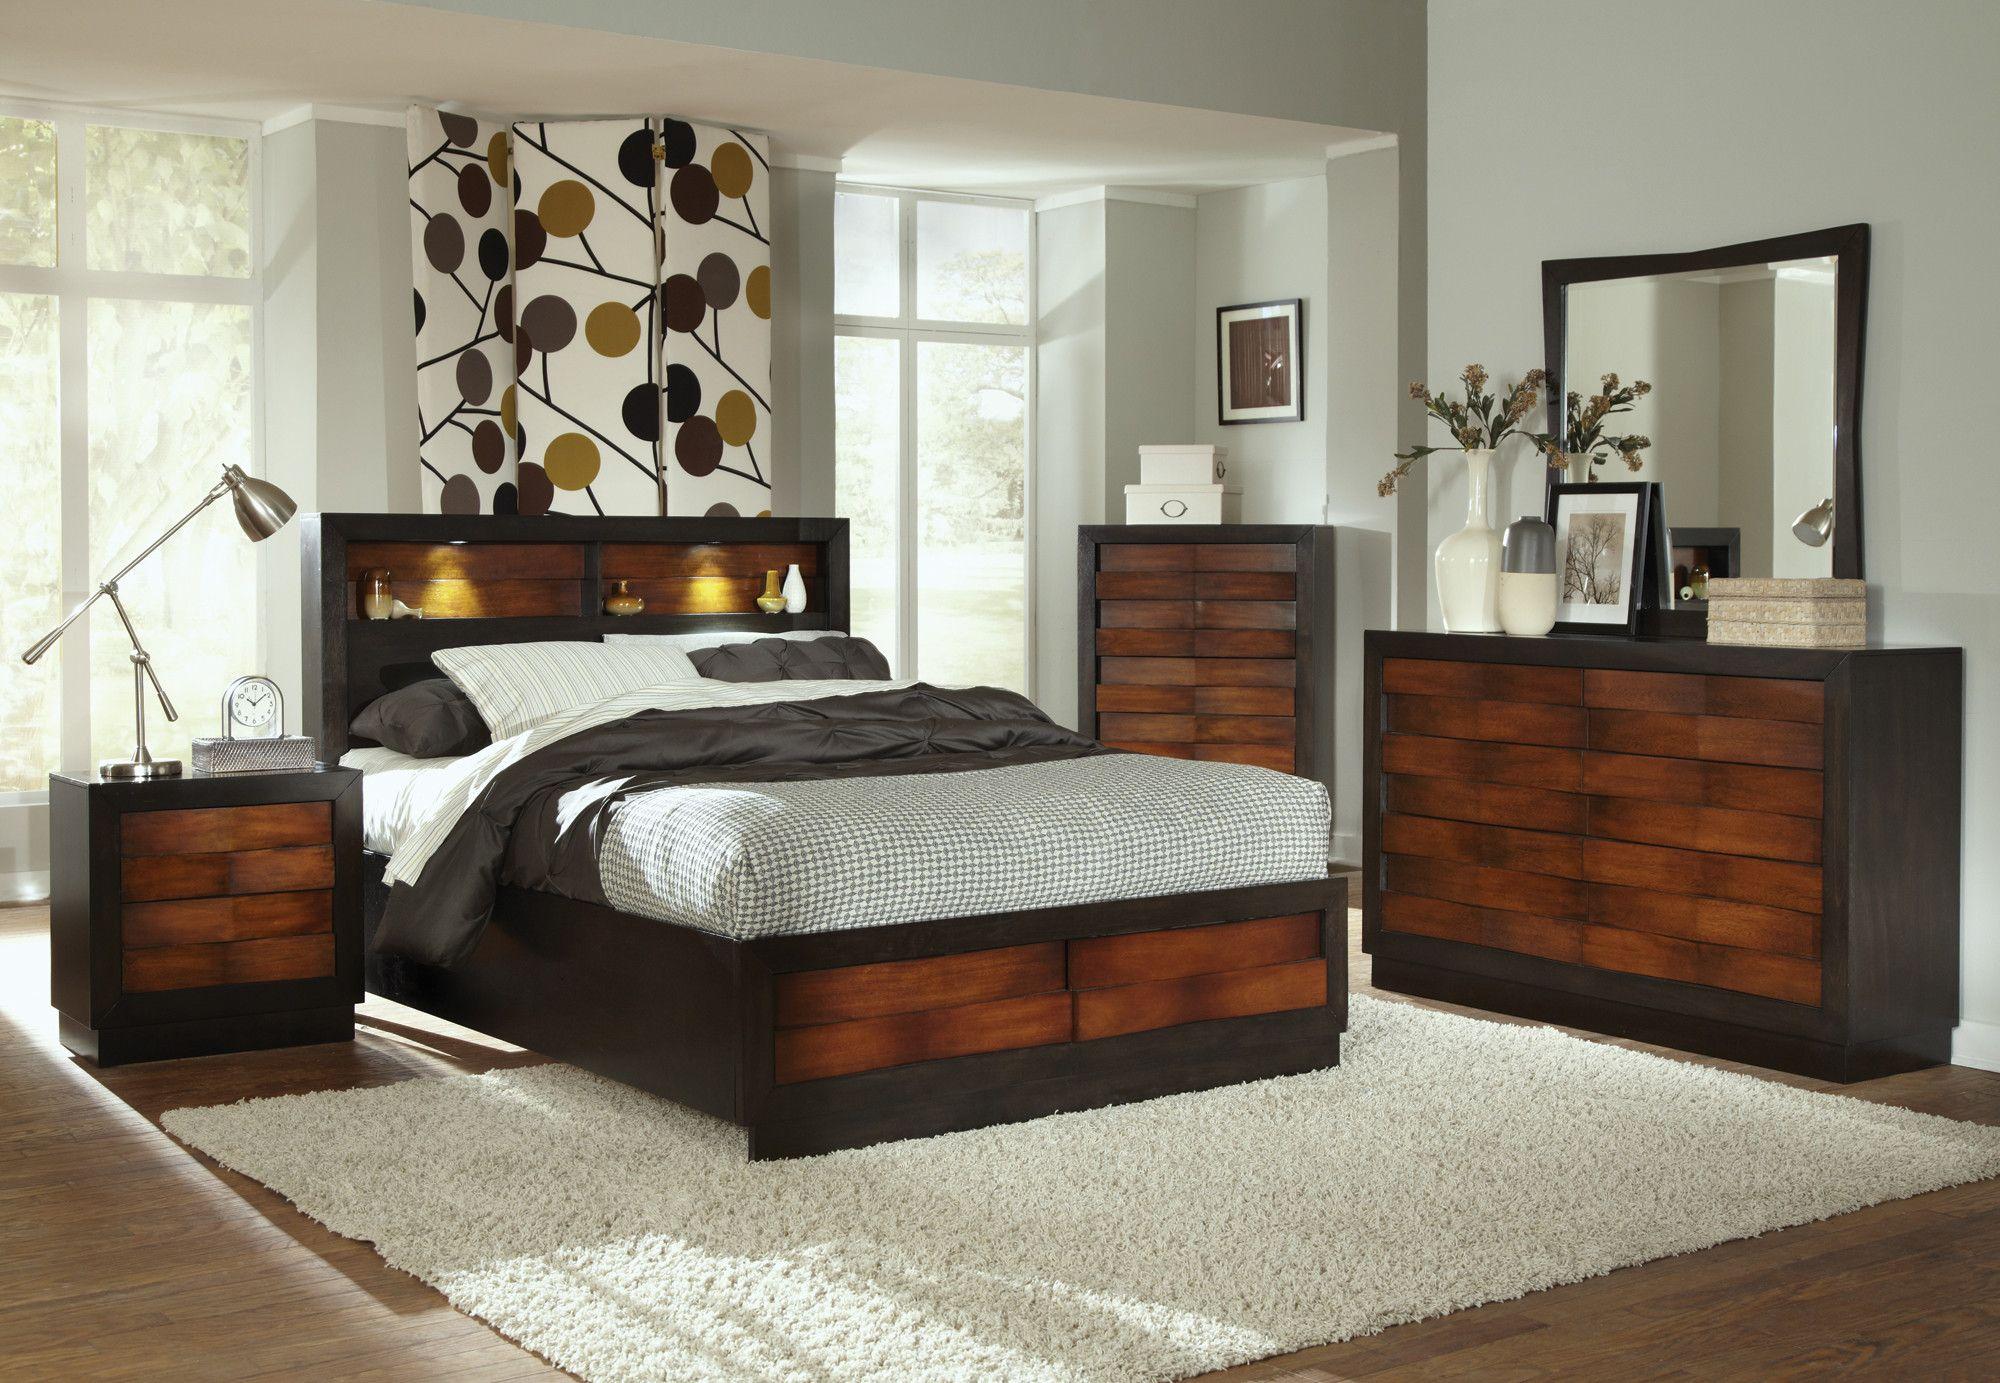 Online Home Store For Furniture Decor Outdoors More Wayfair Bedroom Furniture Sets Affordable Bedroom Furniture Cheap Bedroom Furniture Sets